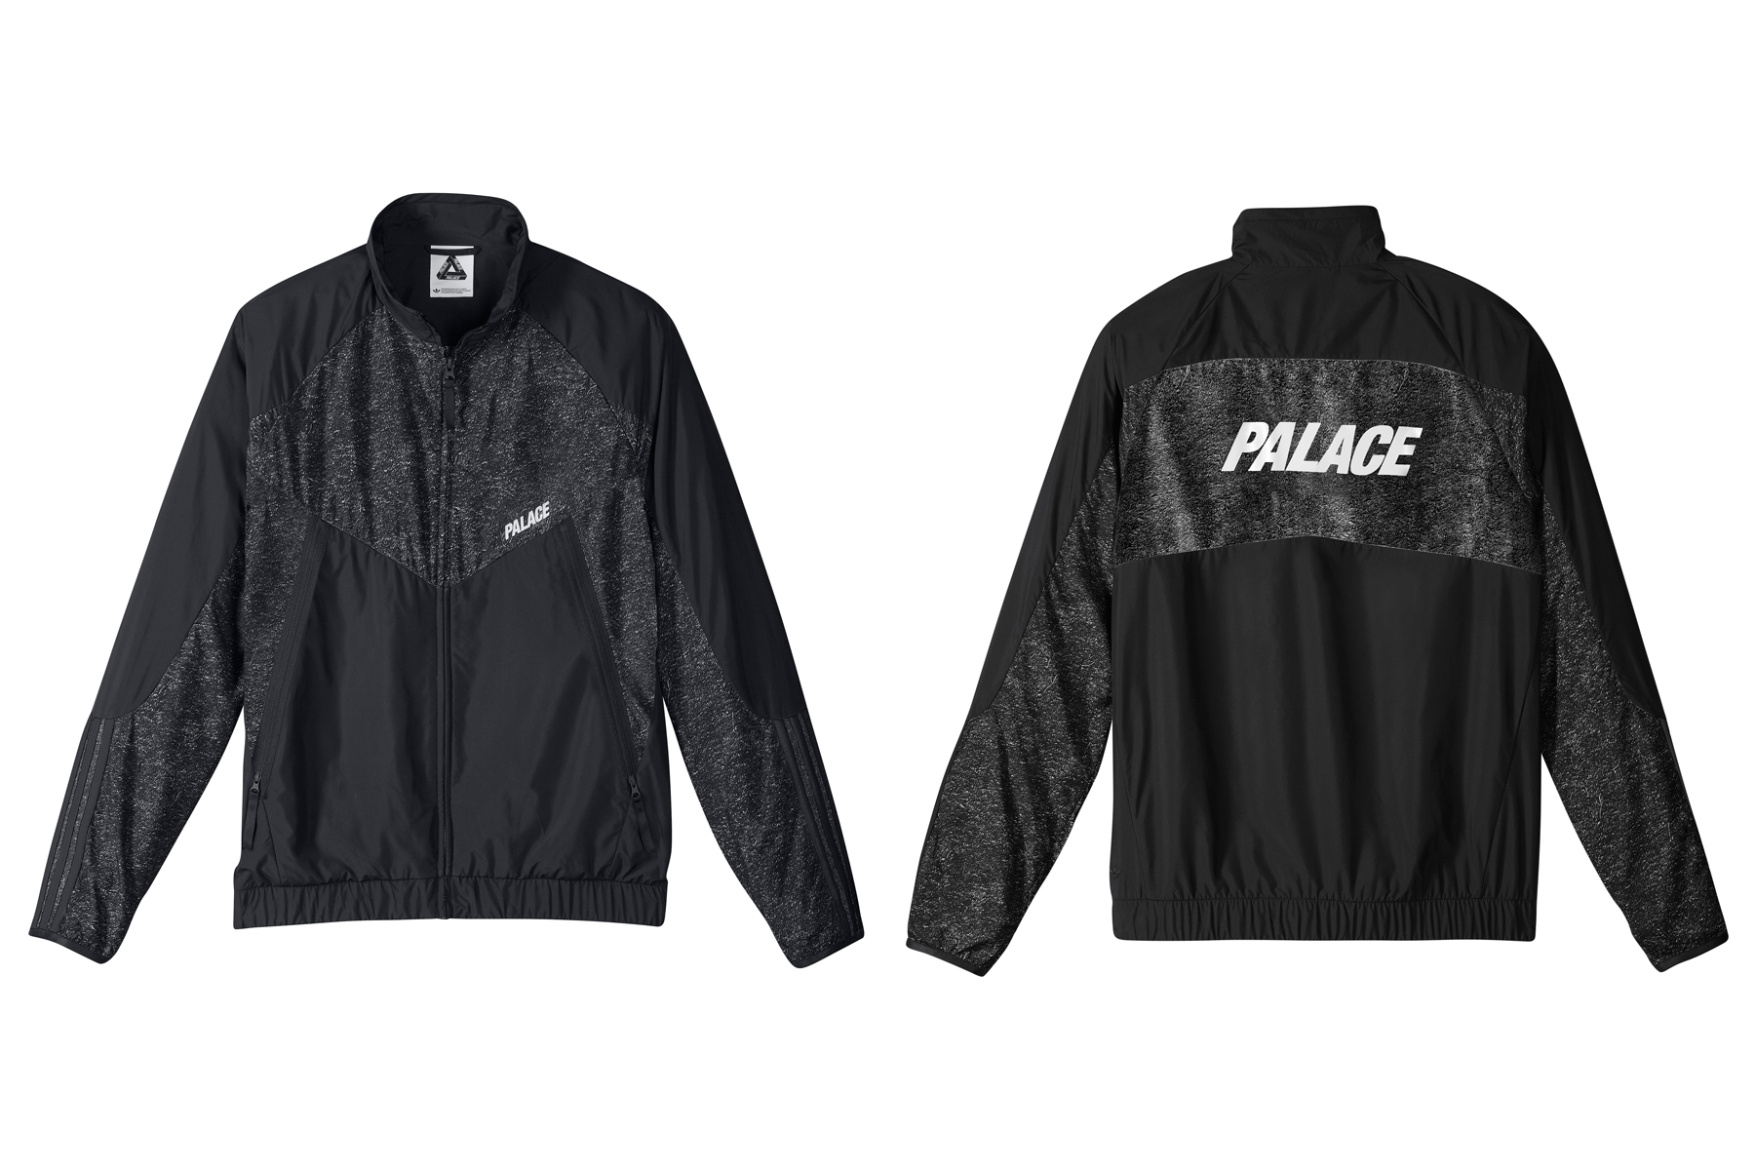 palace-adidas-originals-2016-spring-summer-collection-part-2-1